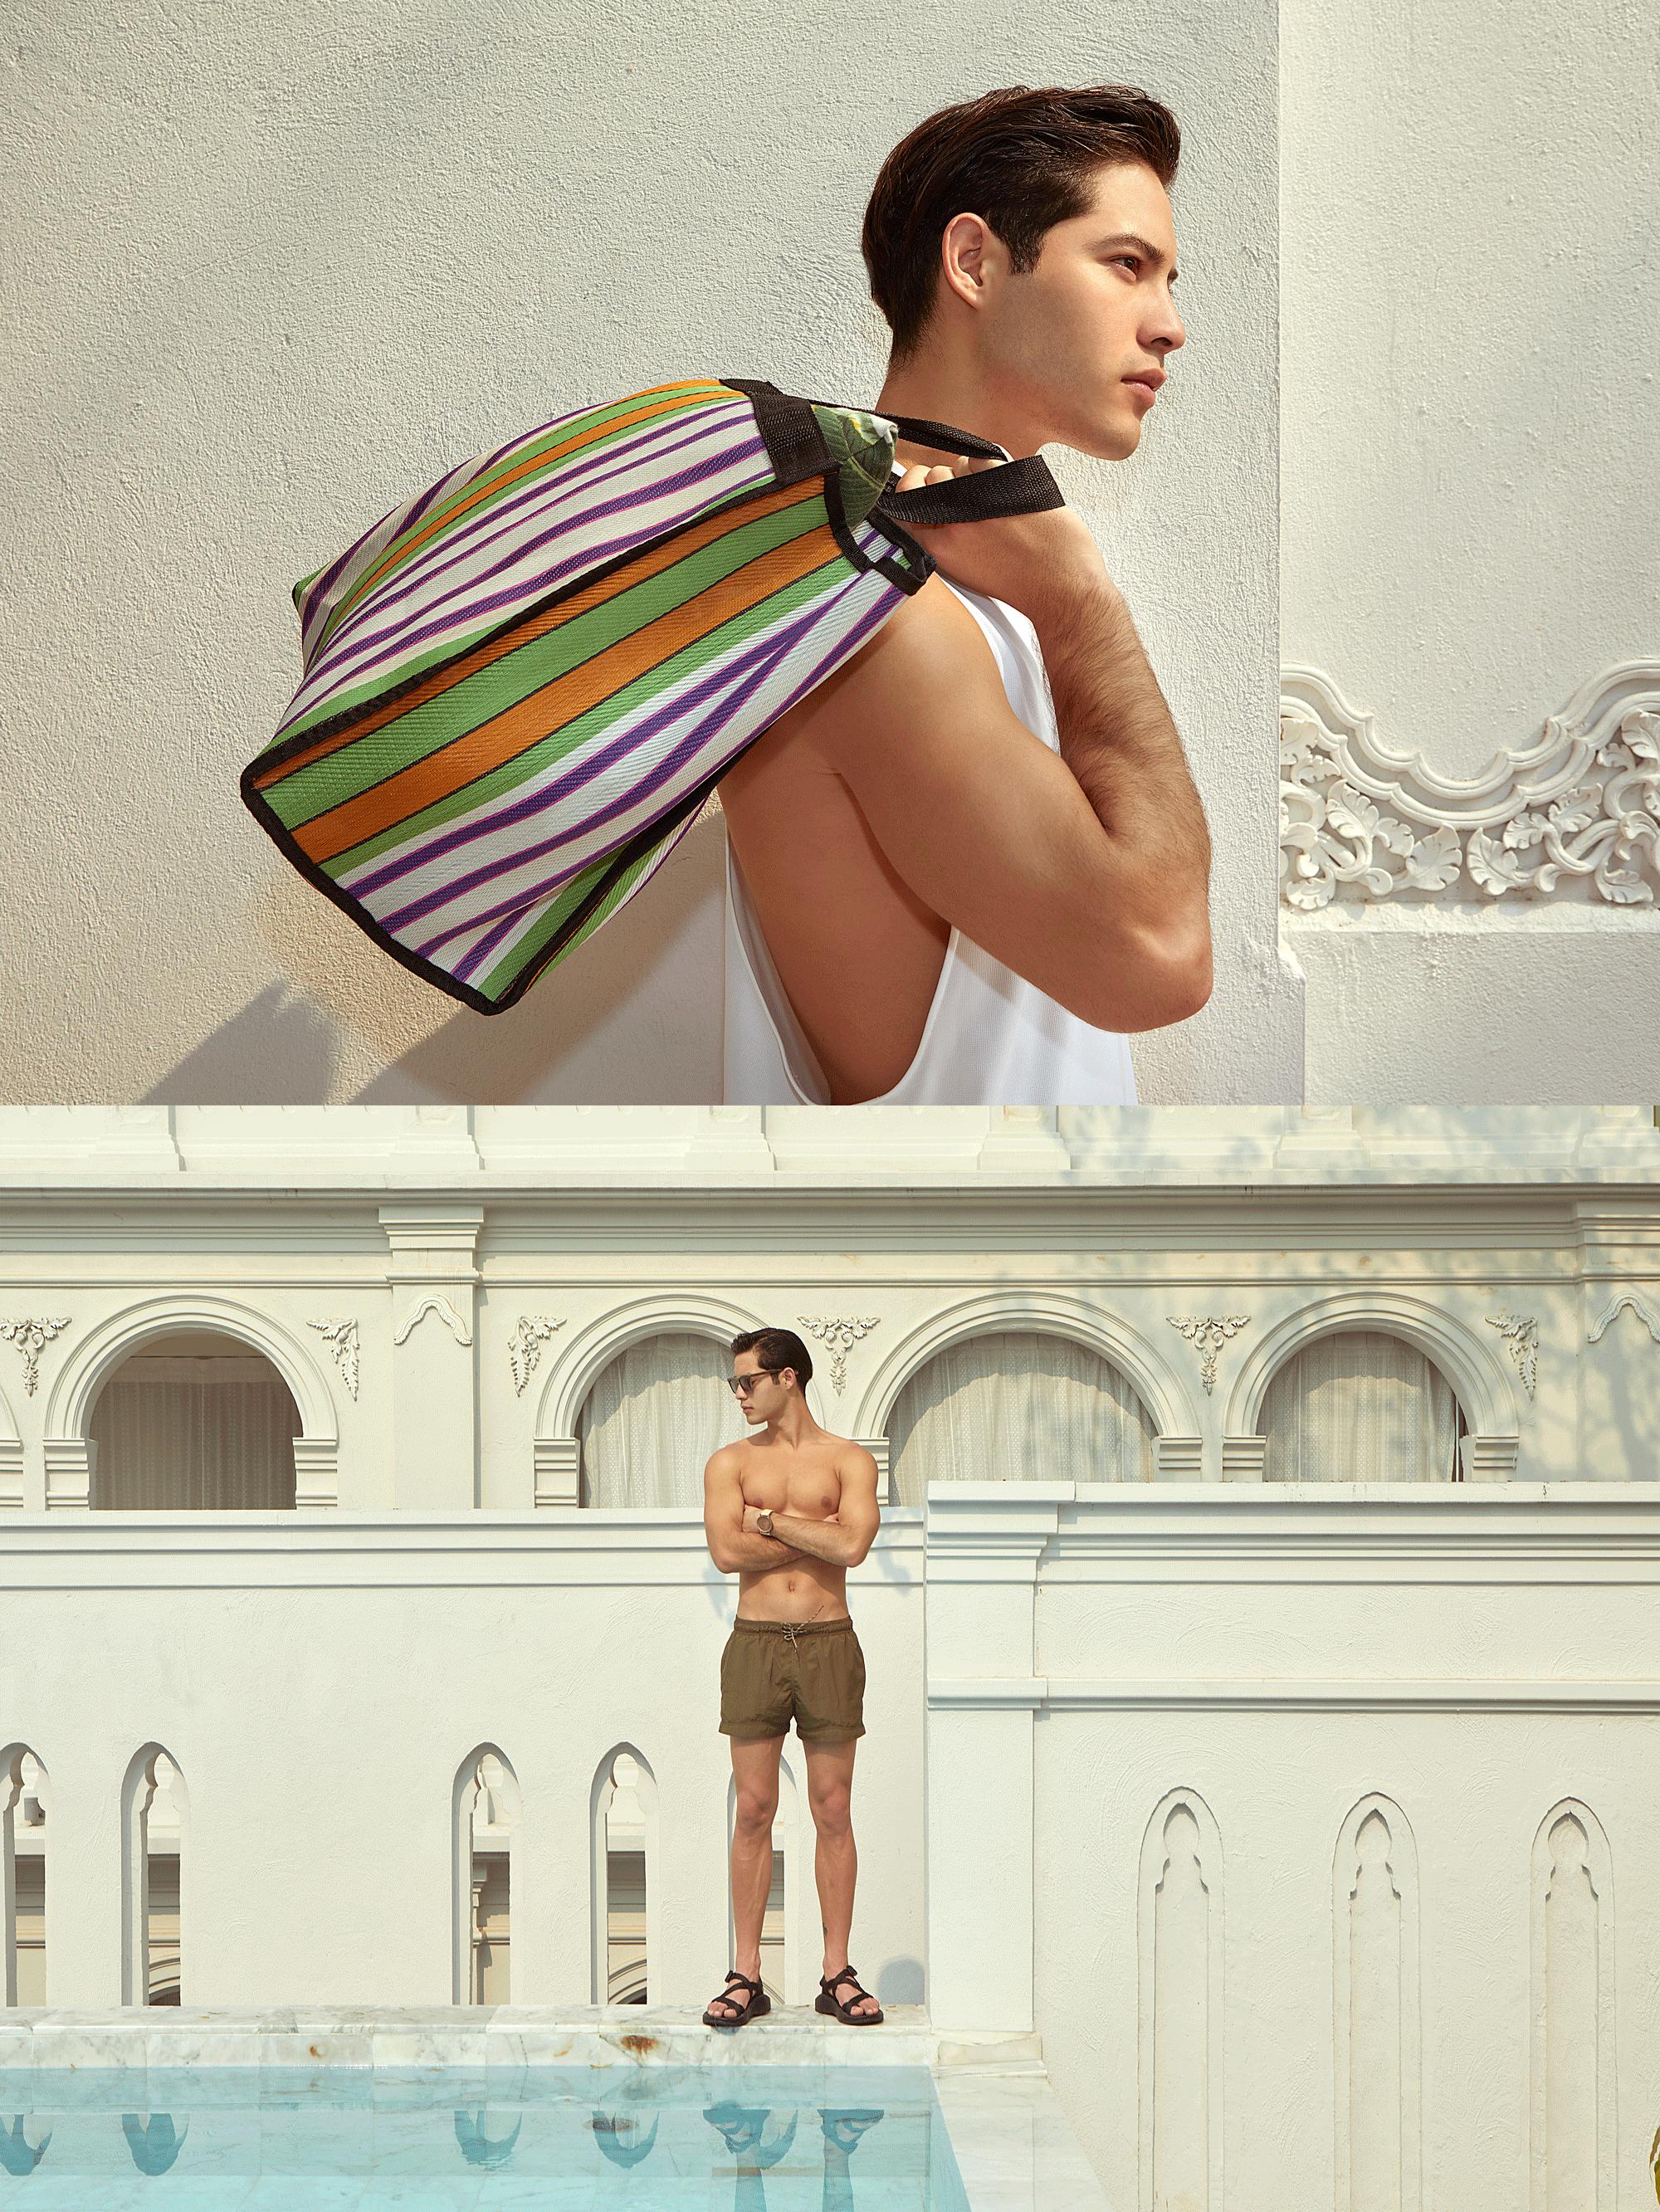 tshirt : SARIT / shorts : H&M / bag : Red Modeling / sunglasses : Blake Kuwahara / watch : FORREST